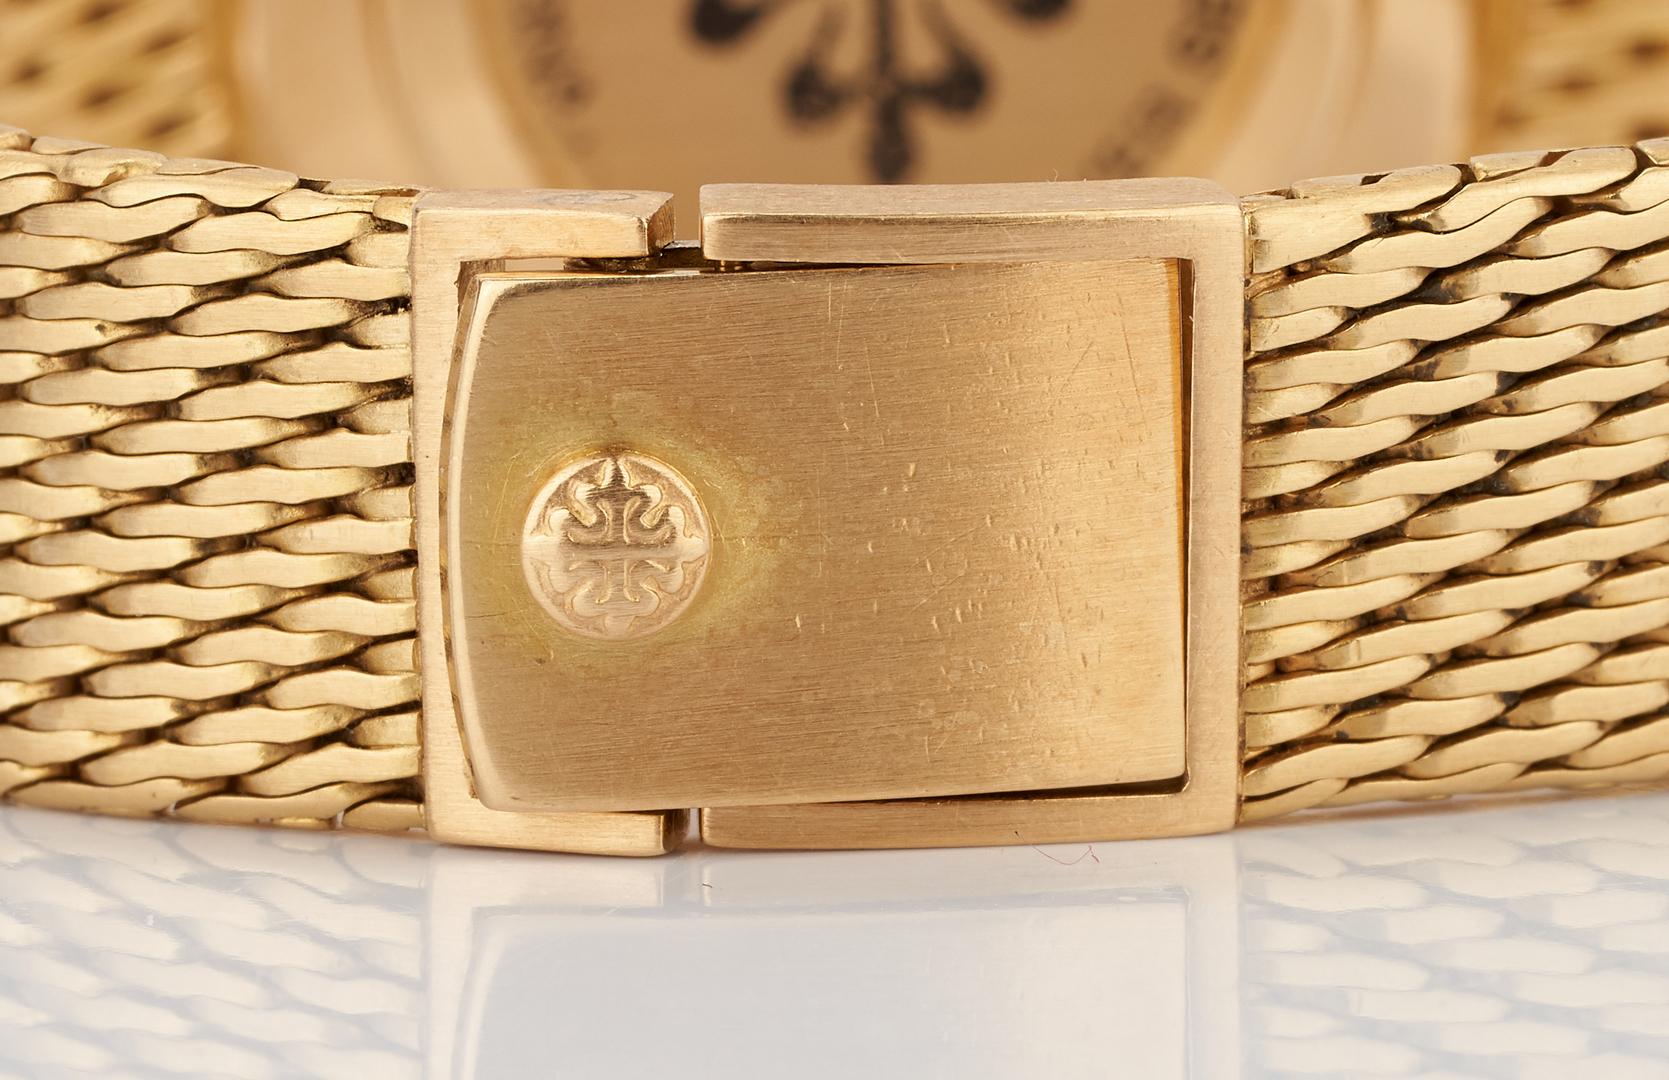 Lot 24: Men's 18K Yellow Gold Patek Philippe Watch